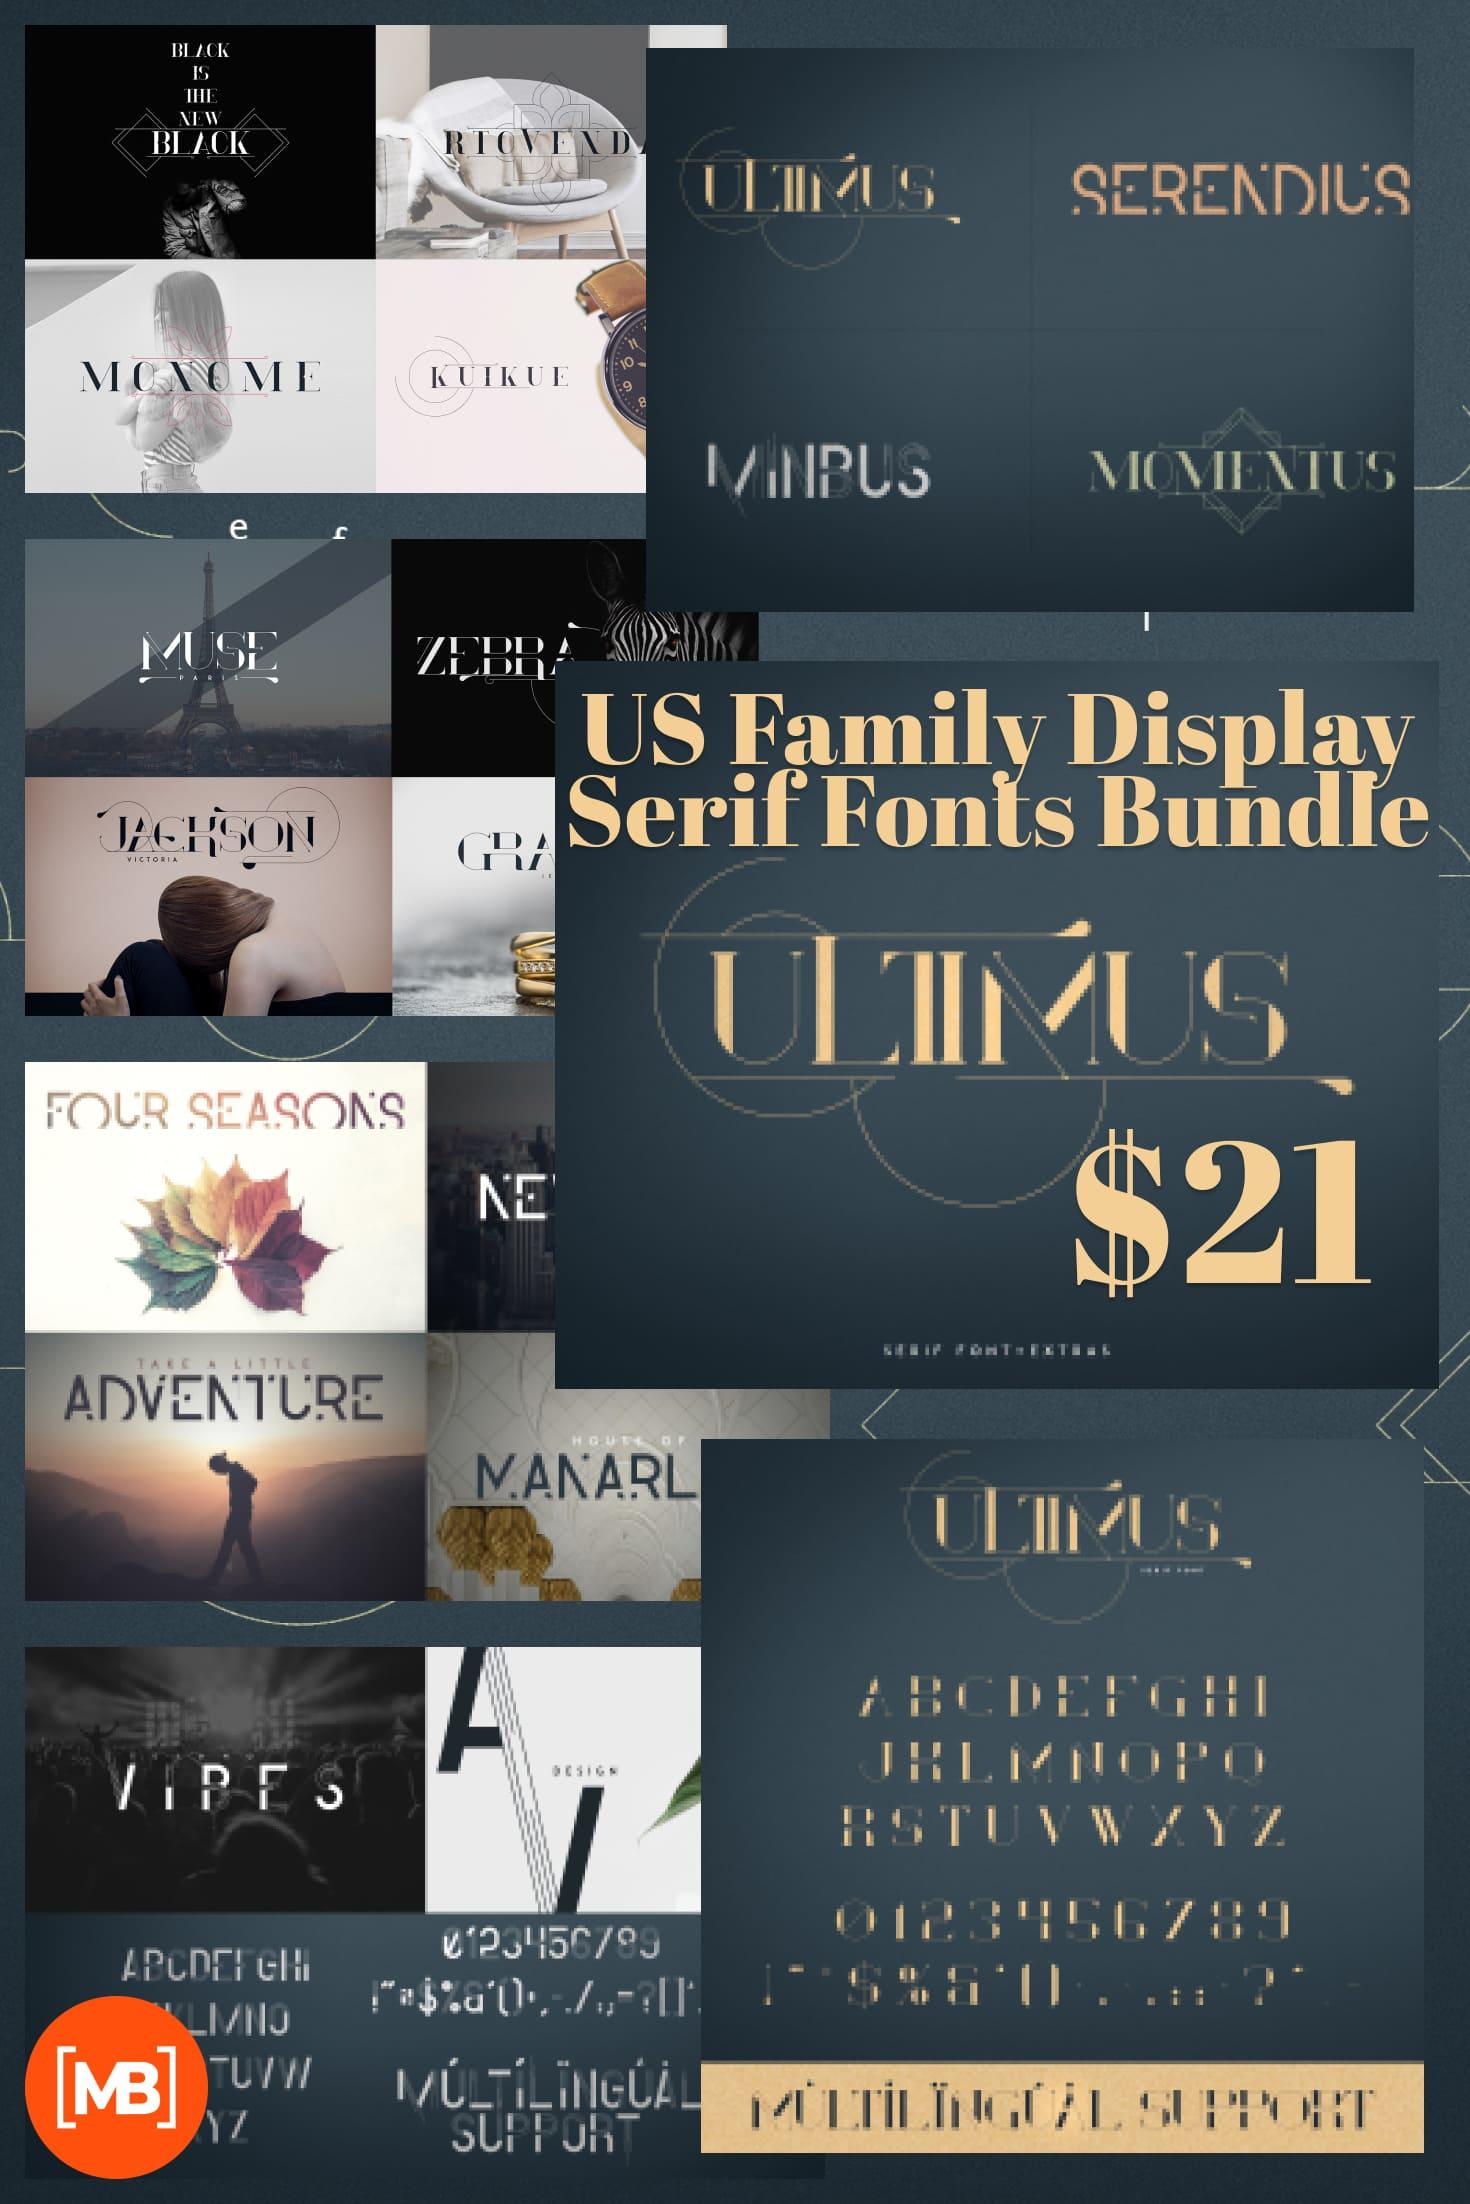 Pinterest Image: US Family Display Serif Fonts Bundle: 2 Serif Fonts & 2 Display Fonts - $21.